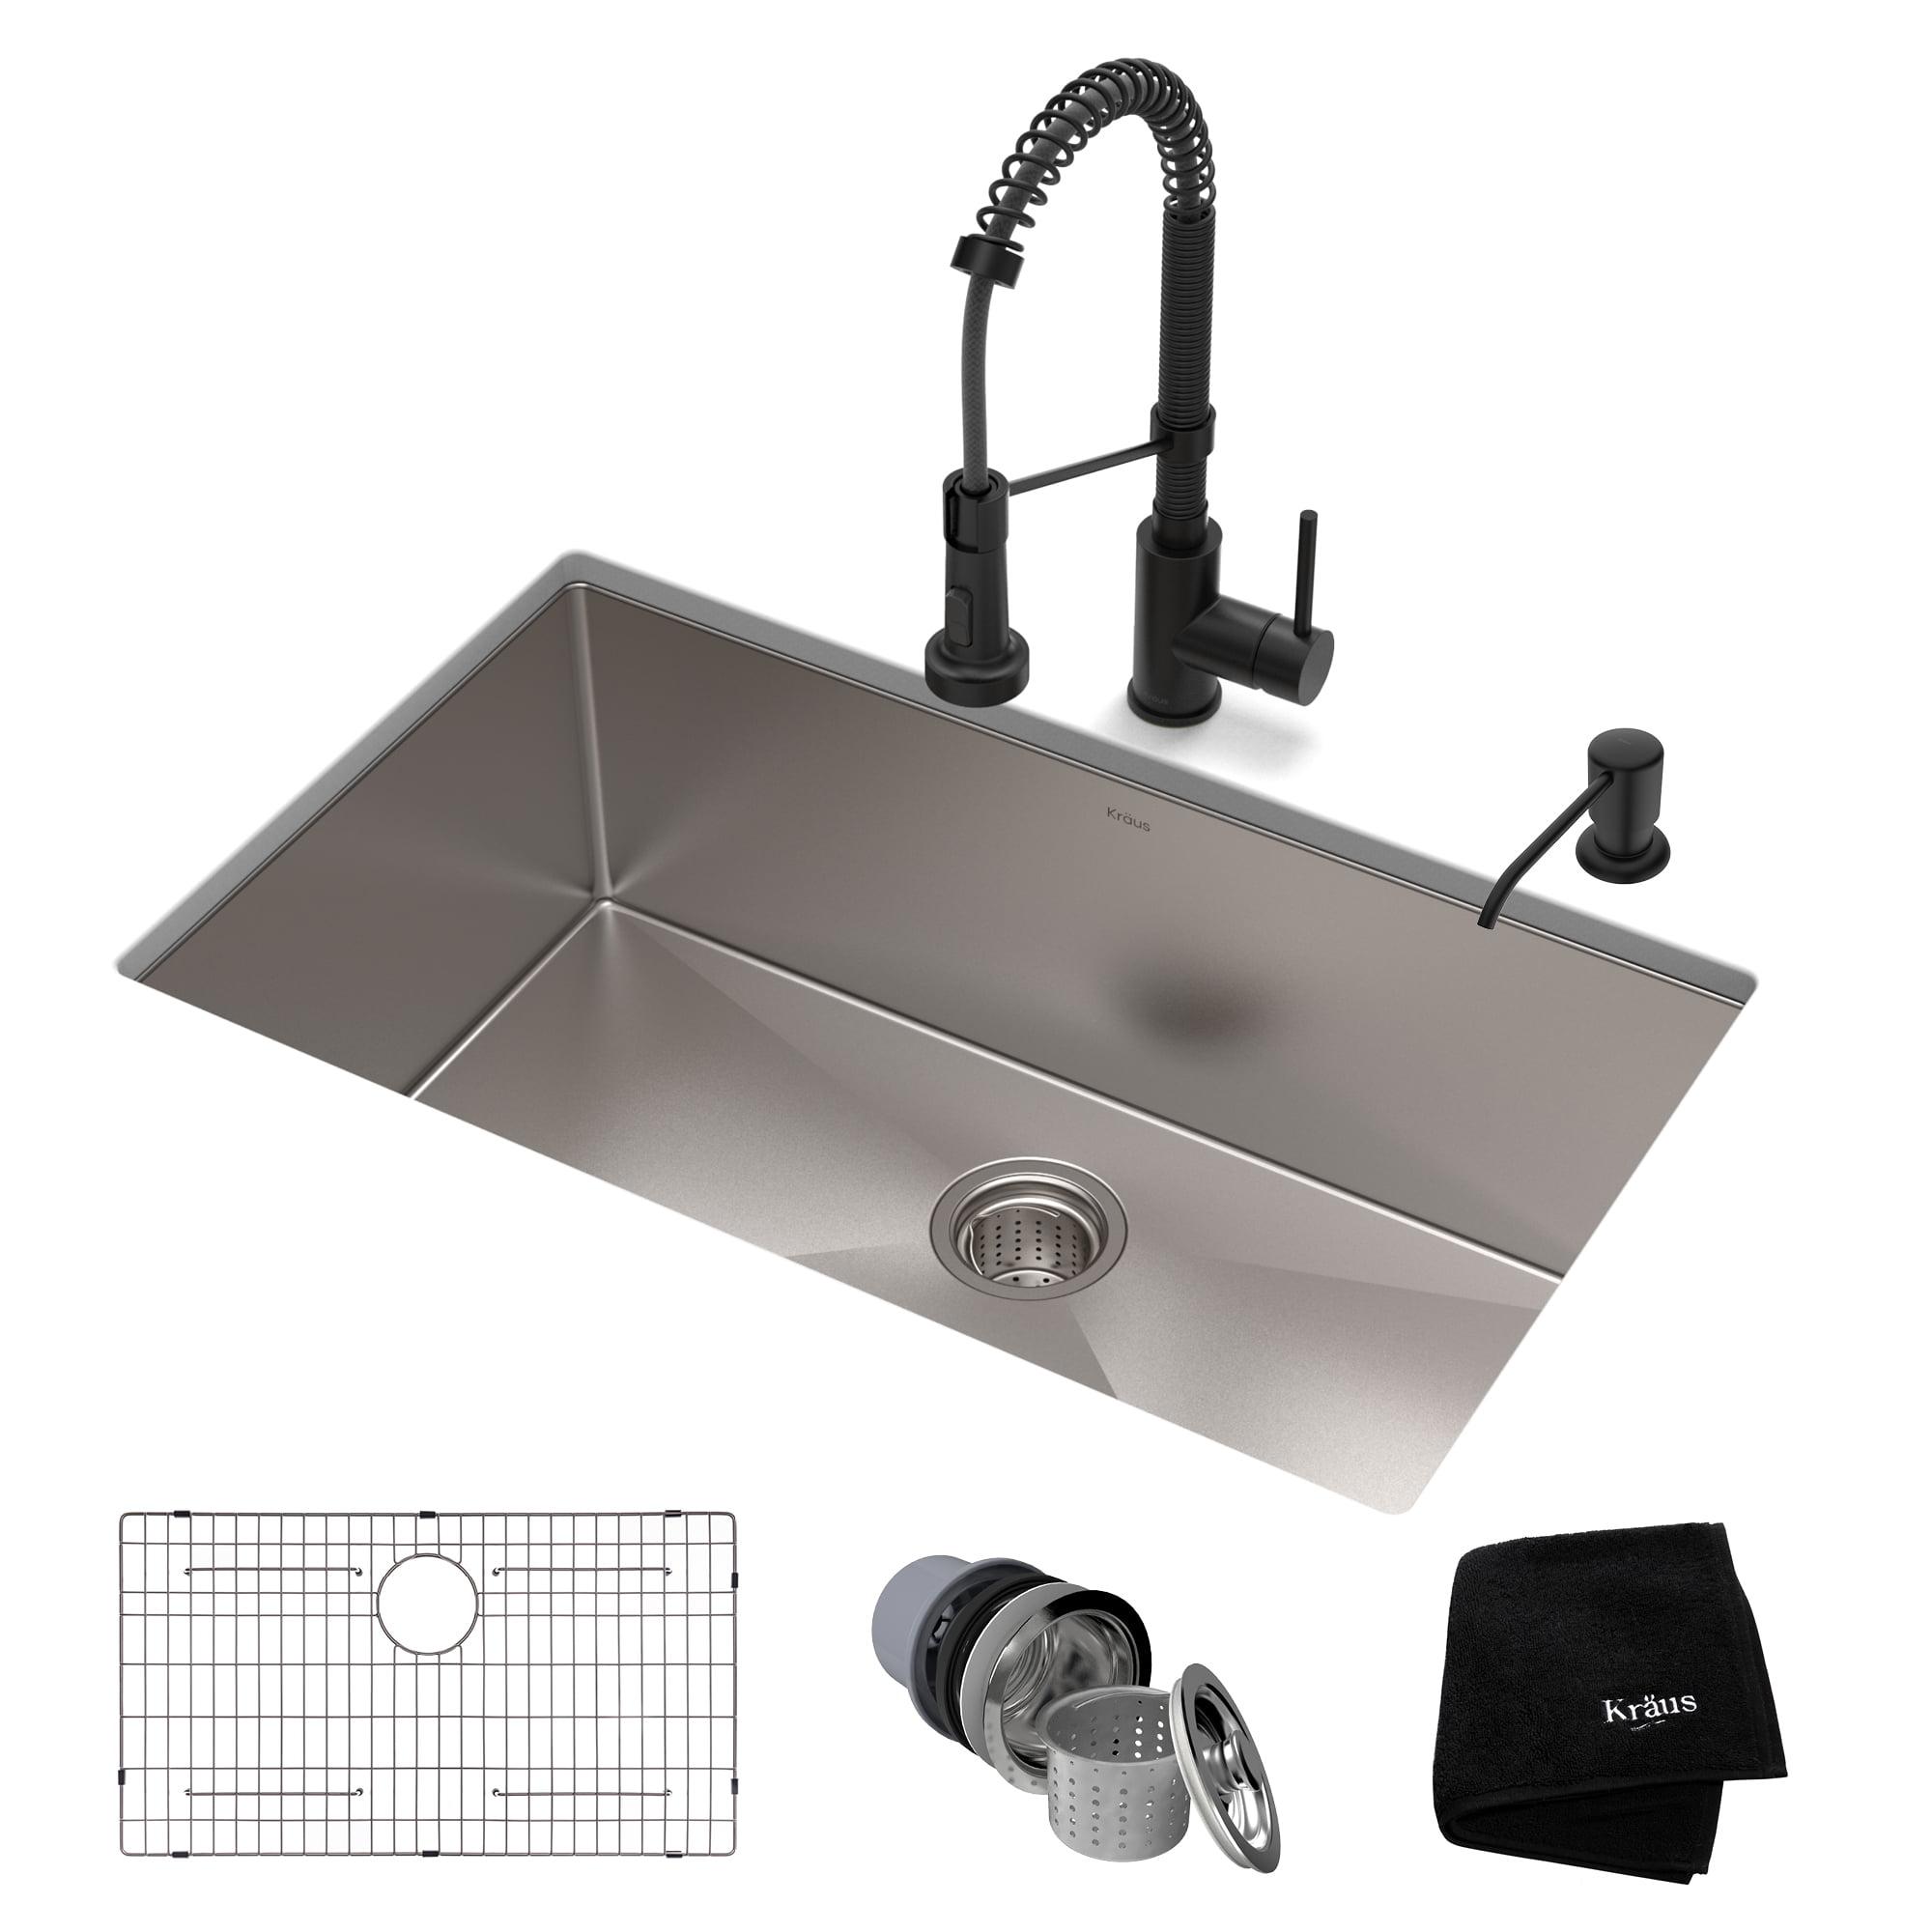 Kraus 32 Inch 16 Gauge Standart Pro Kitchen Sink Combo Set With Matte Black Bolden 18 Inch Kitchen Faucet And Soap Dispenser Walmart Com Walmart Com